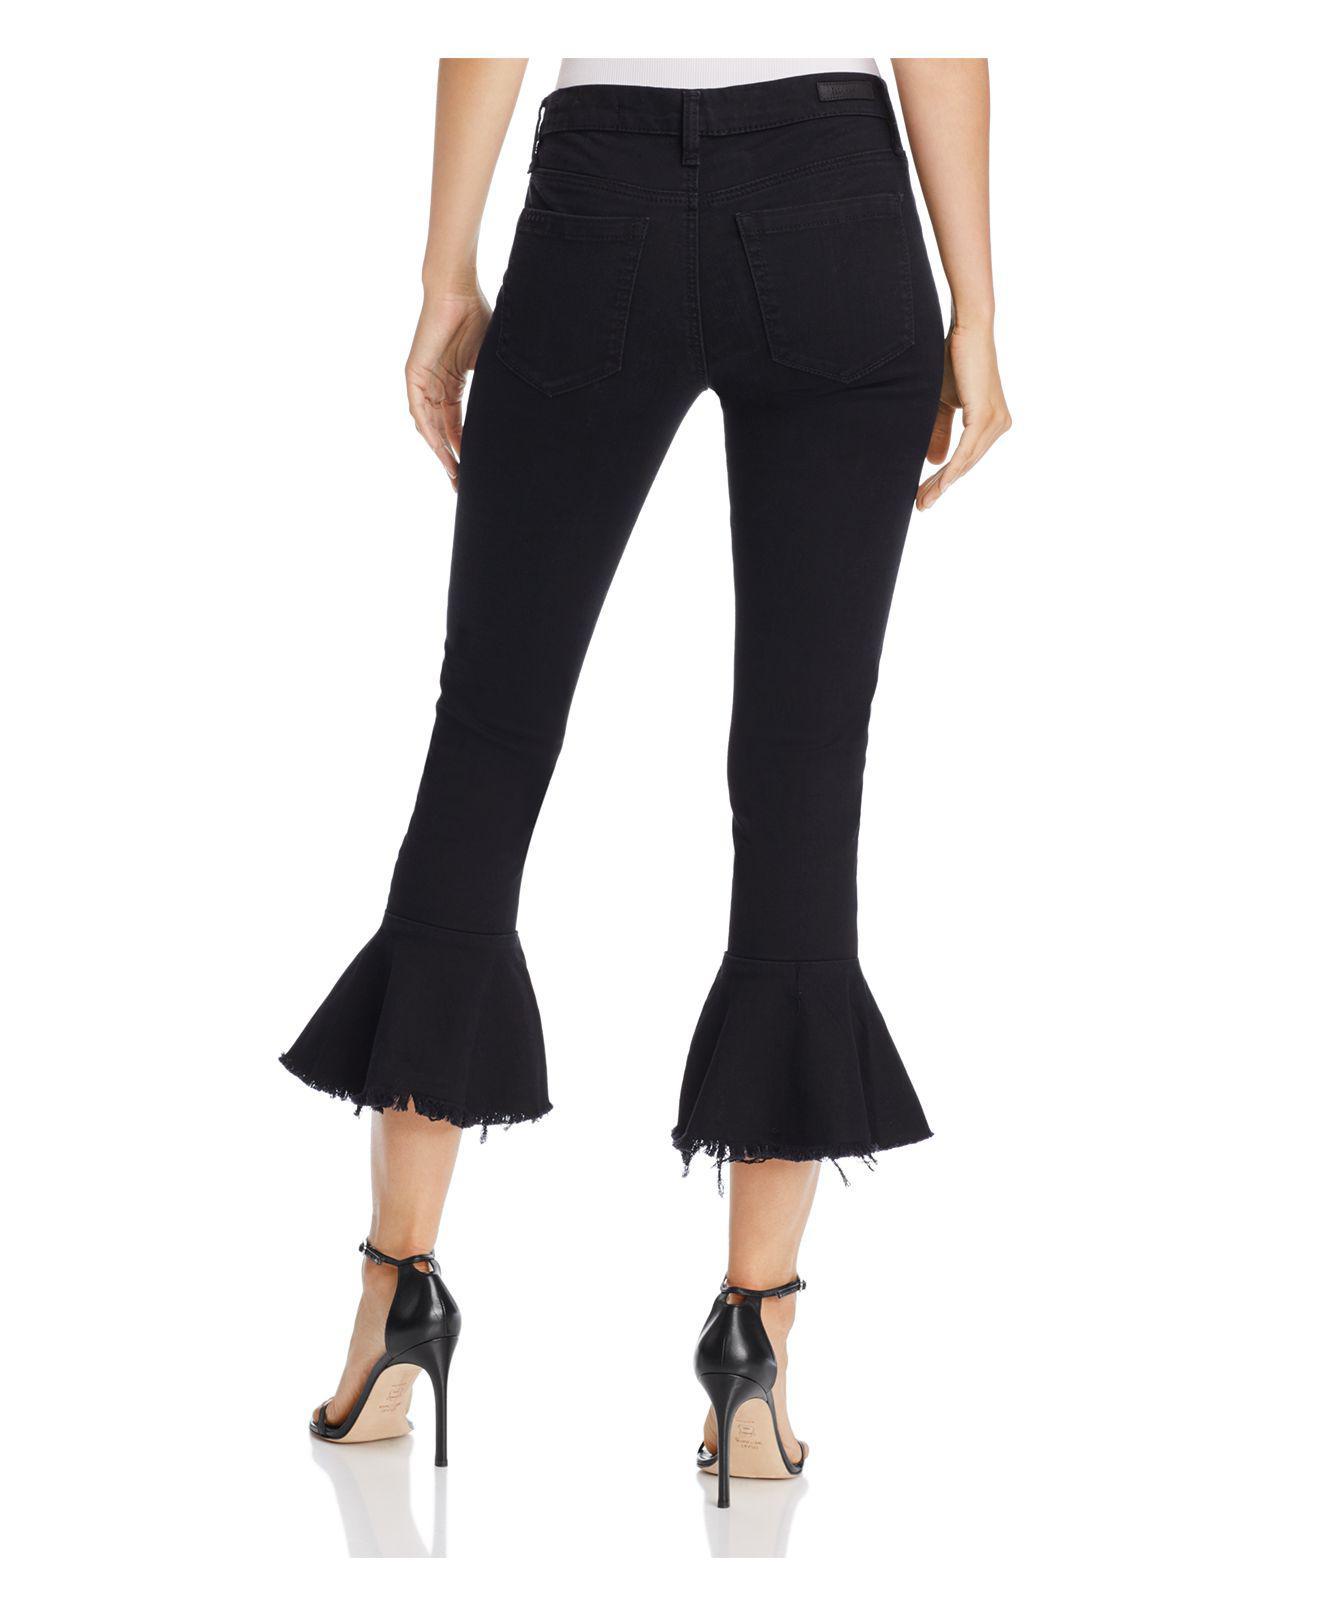 Blank NYC Denim Ruffle-hem Cropped Jeans In Night Mania in Black